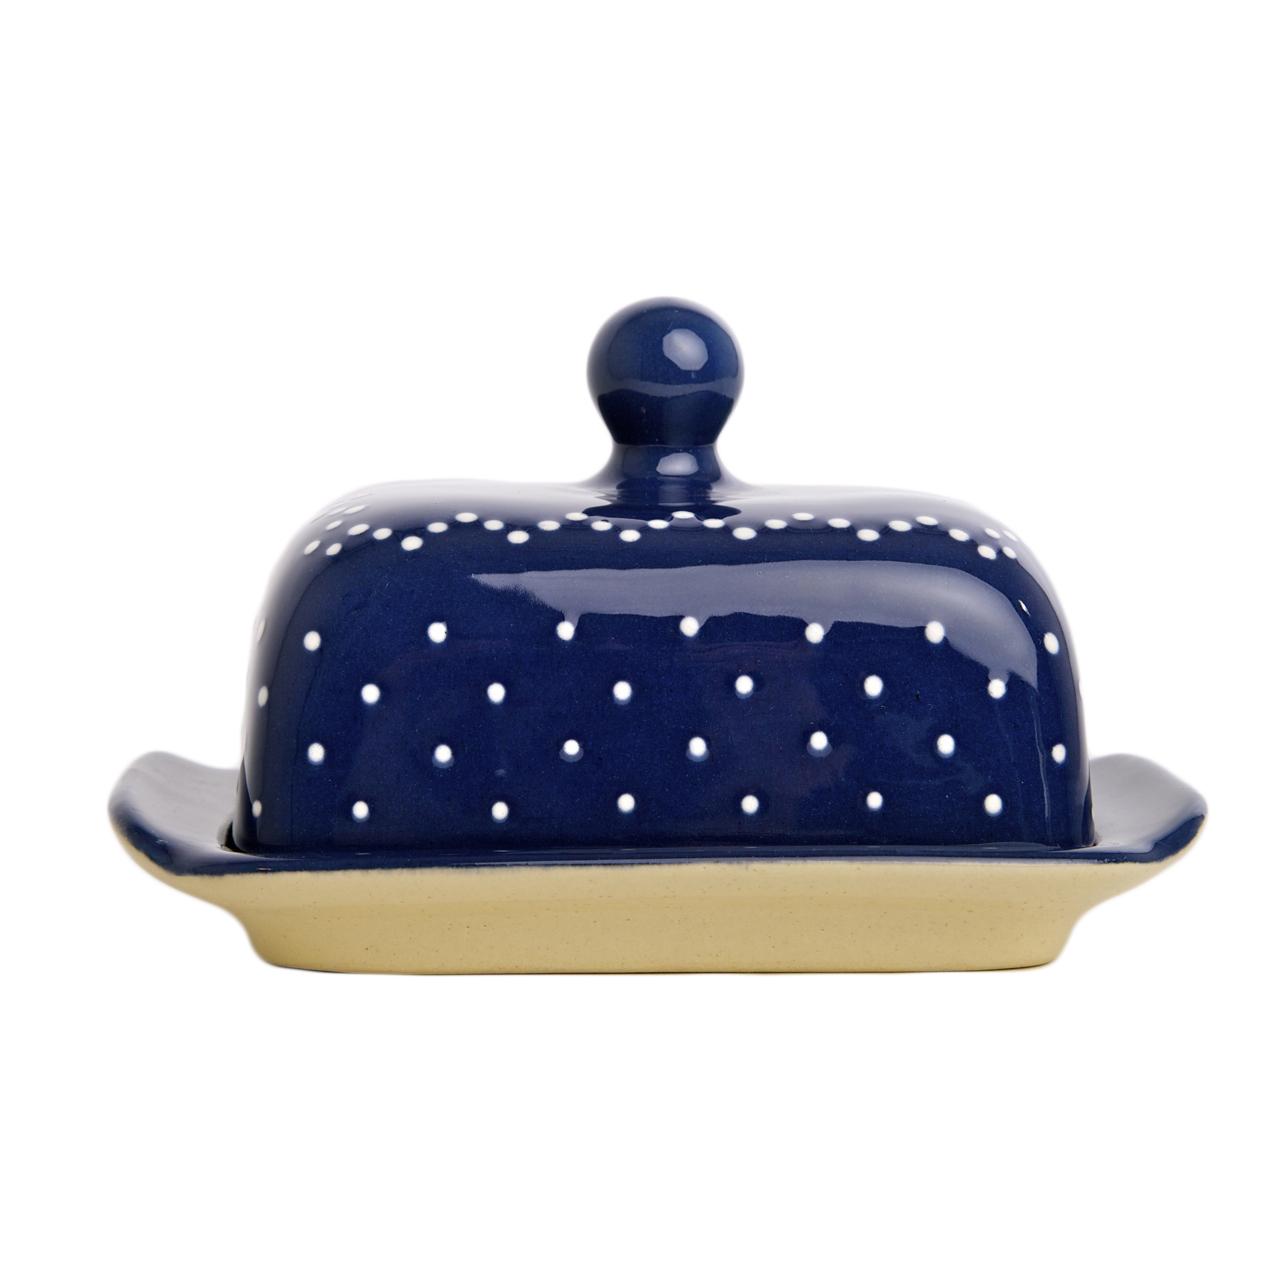 t pferei arnold butterdose blau wei t pferei produkte. Black Bedroom Furniture Sets. Home Design Ideas